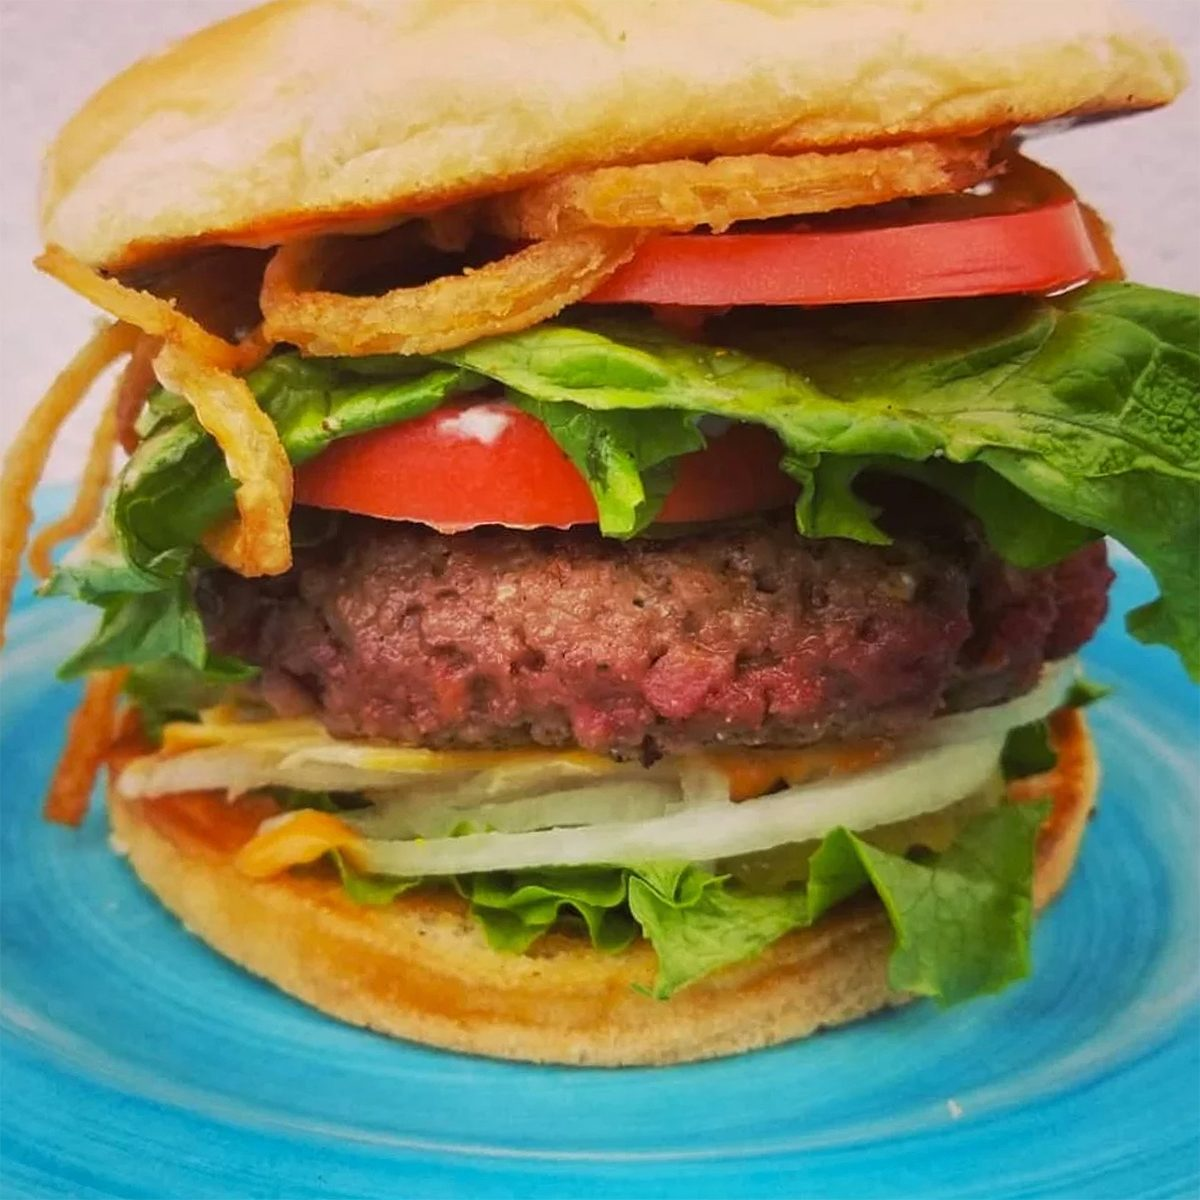 Best vegetarian and vegan restaurant in Mississippi Cool Al's